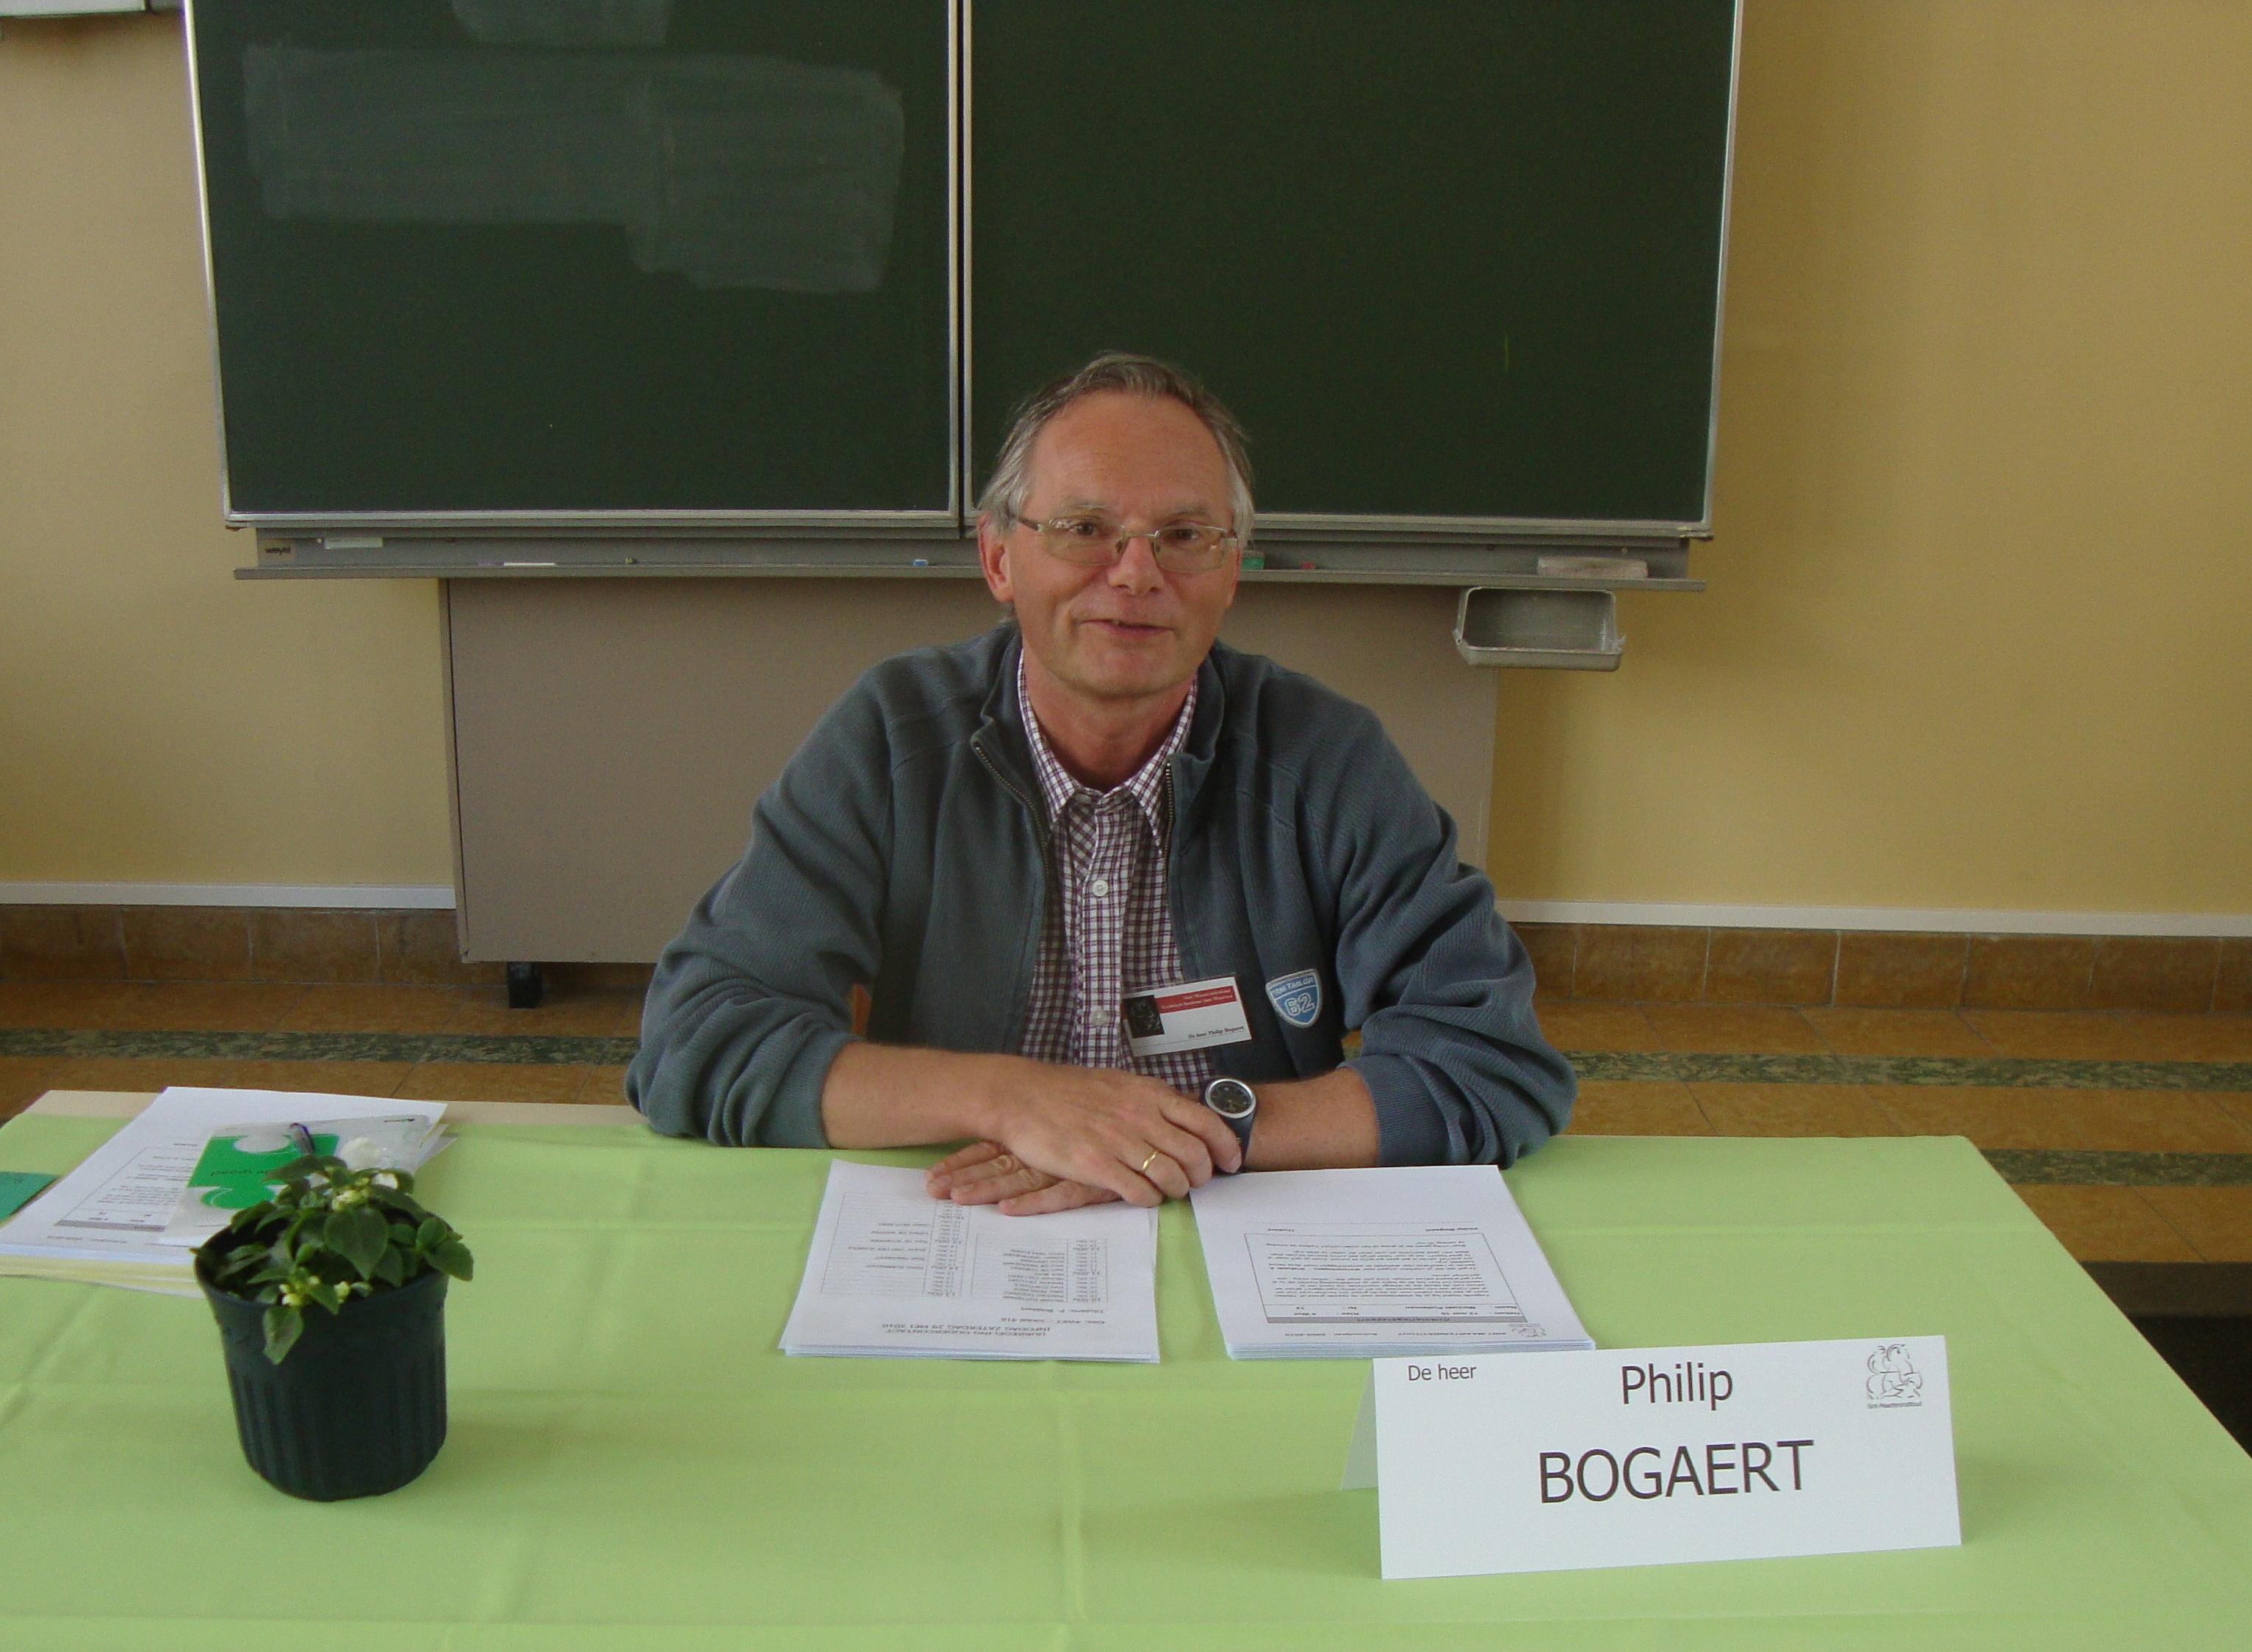 Wiskunde - Bogaert Philip